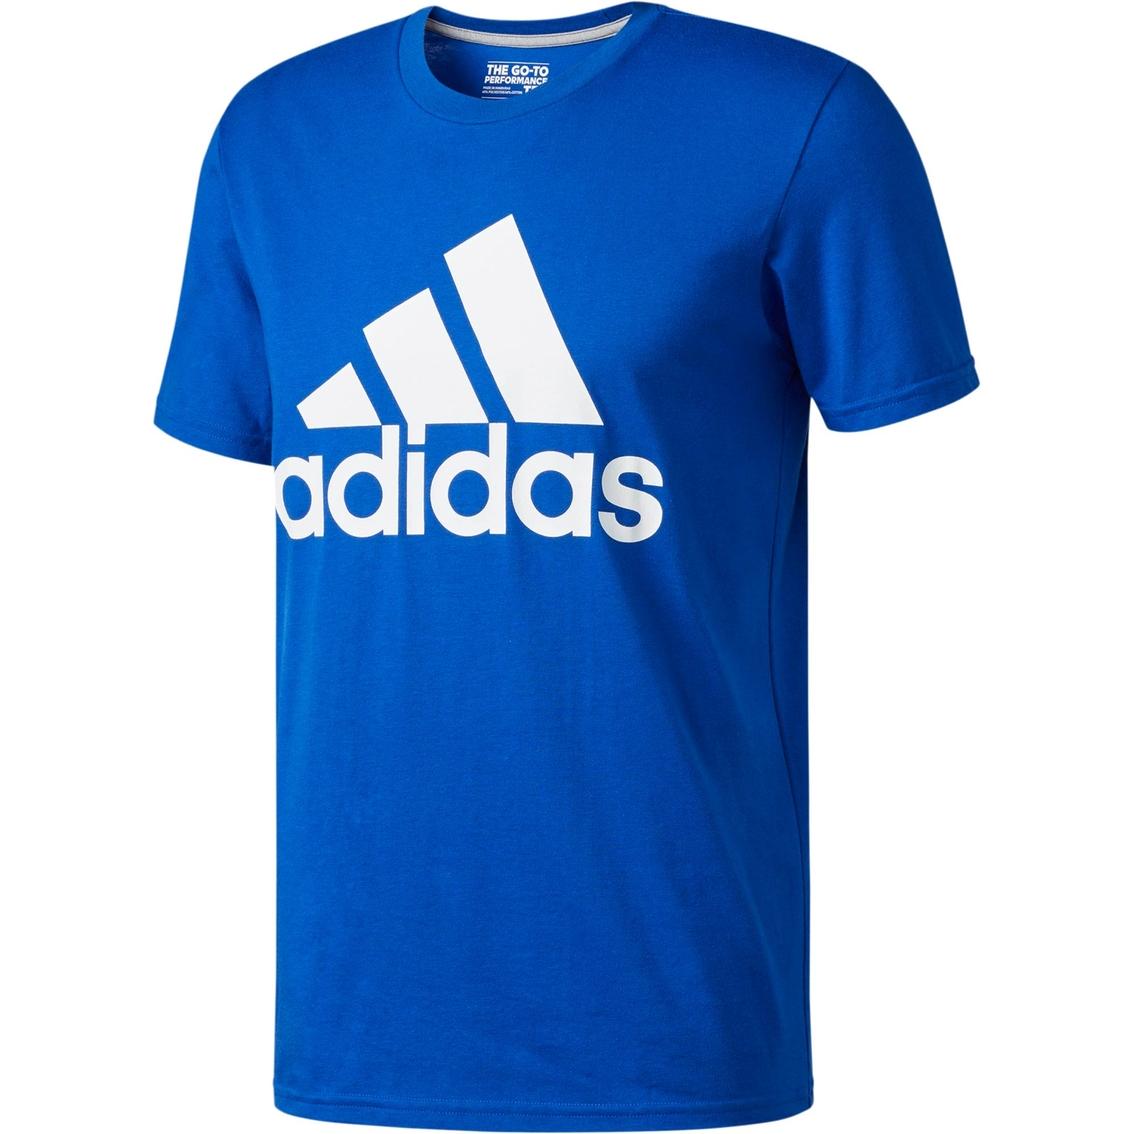 Adidas Badge Of Sport Classic Tee 2   Shirts   Apparel